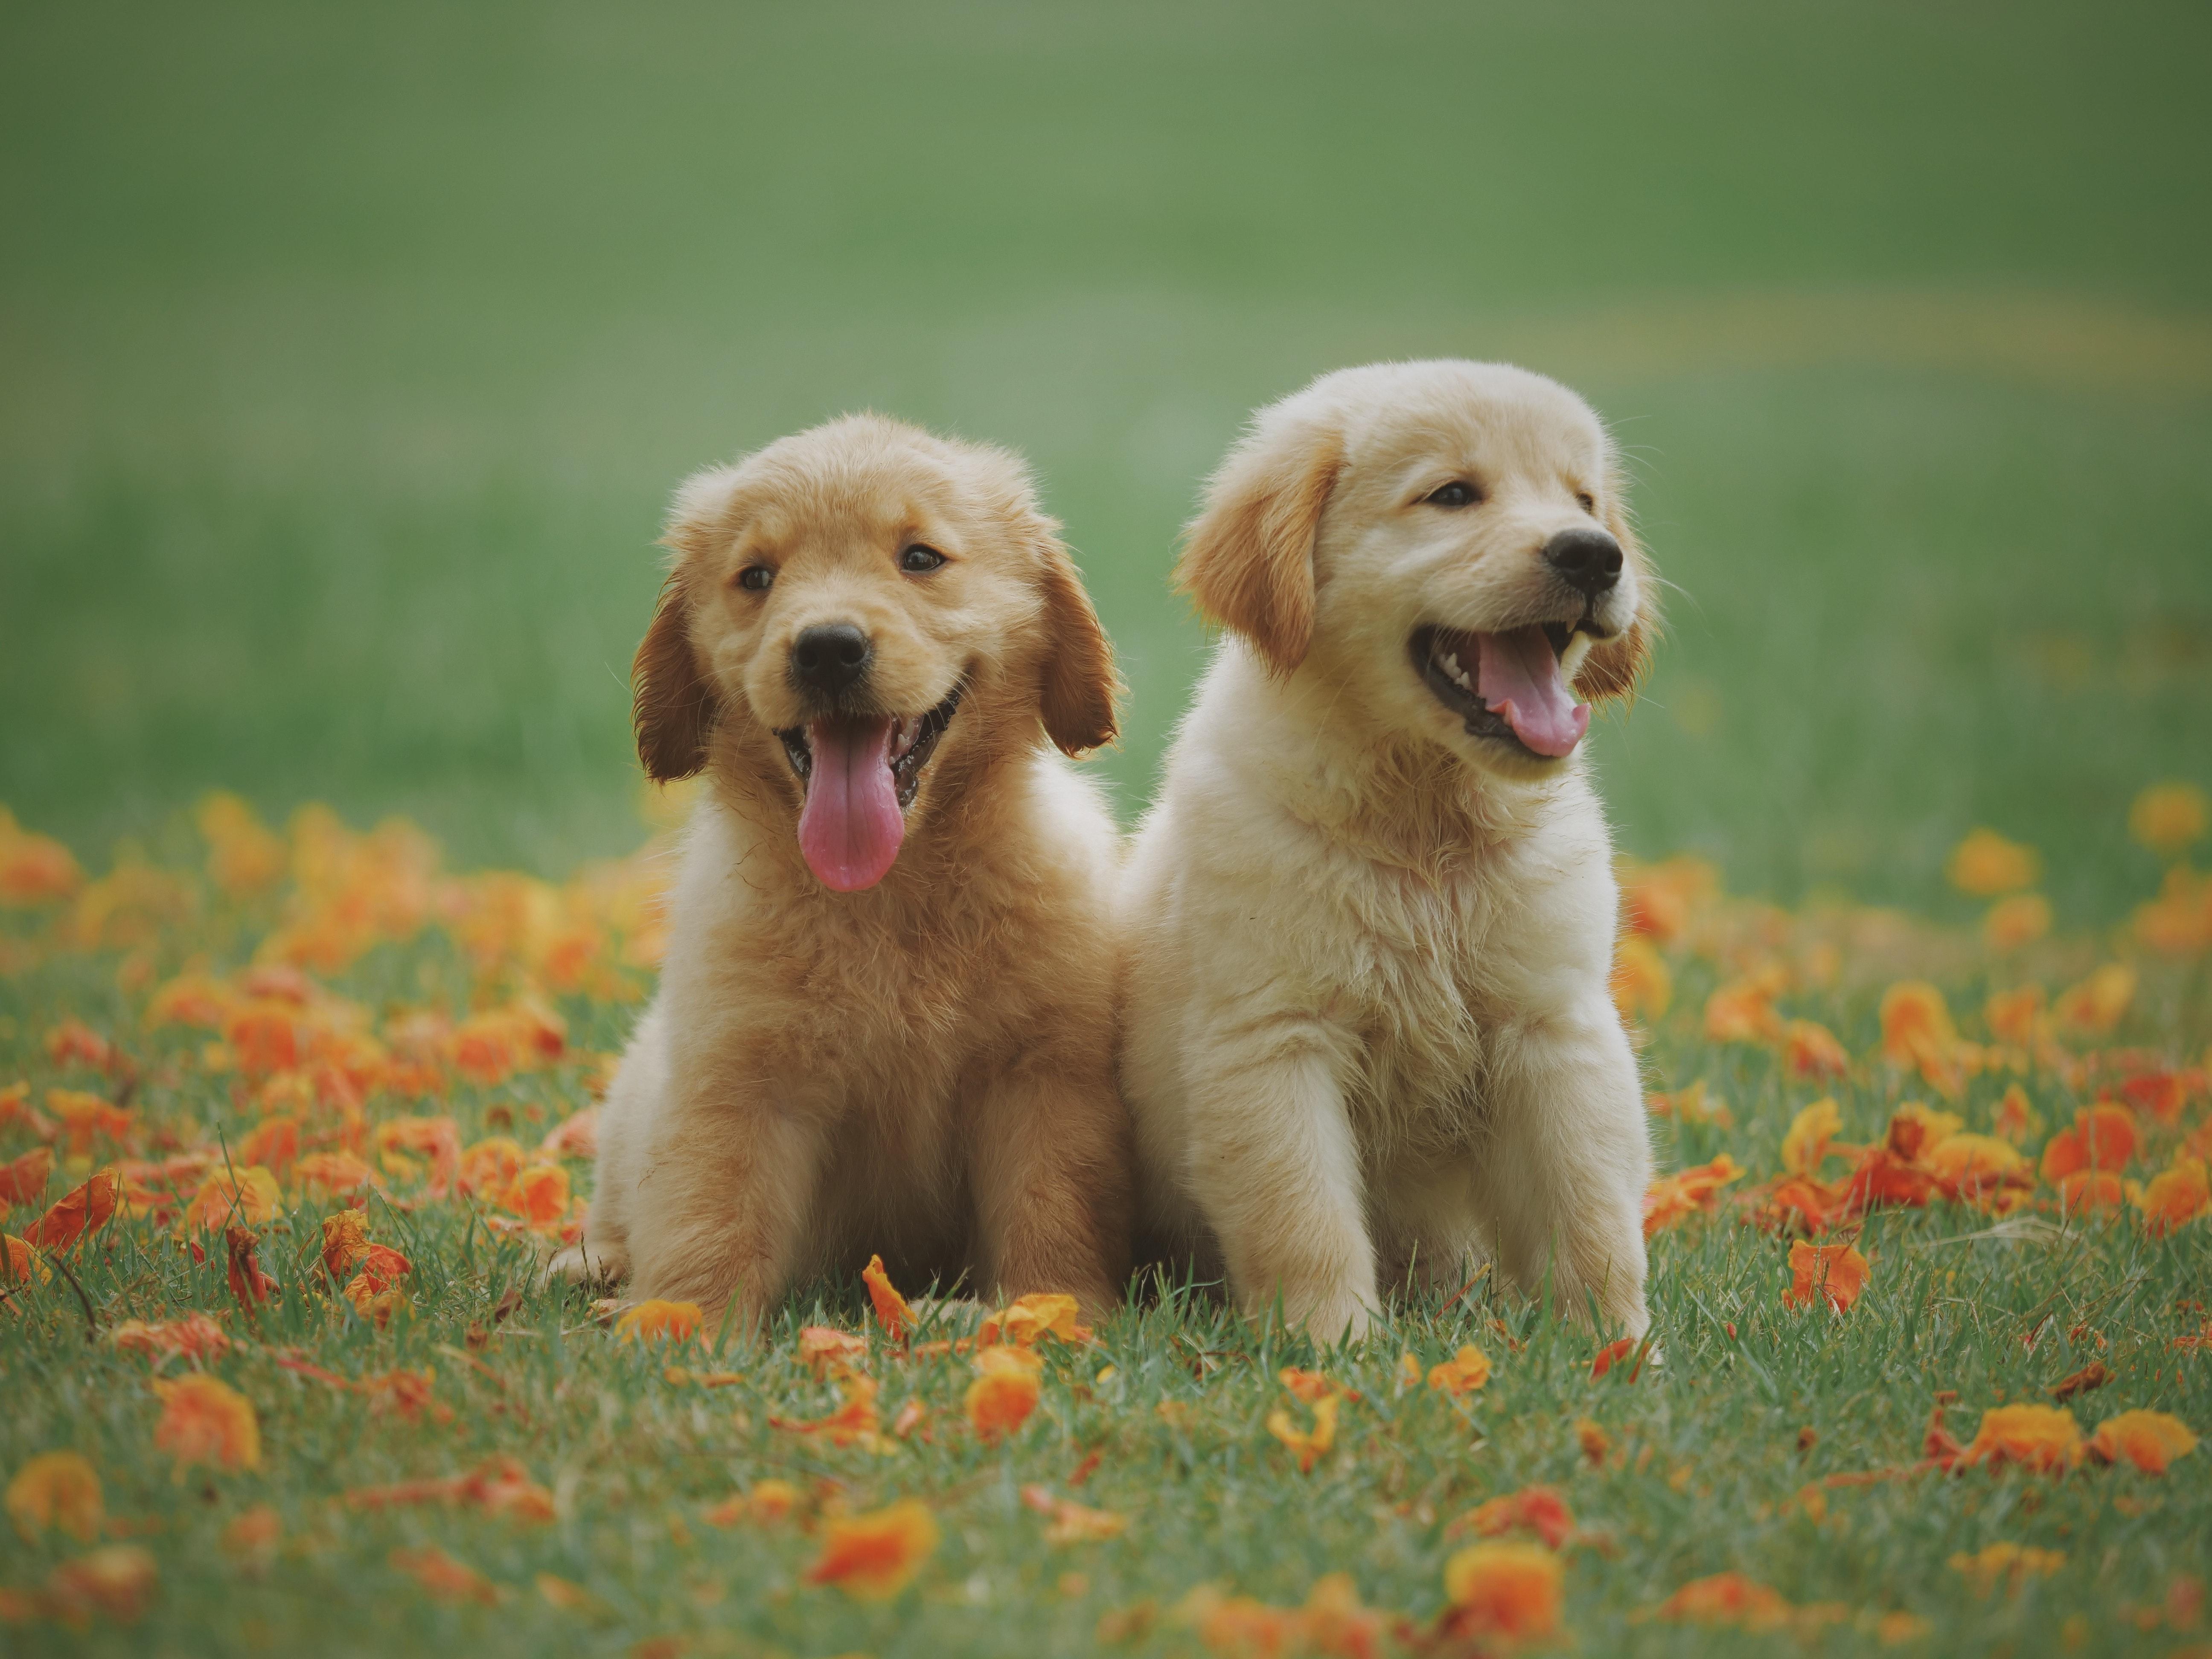 Puppies wallpapers free desktop SF